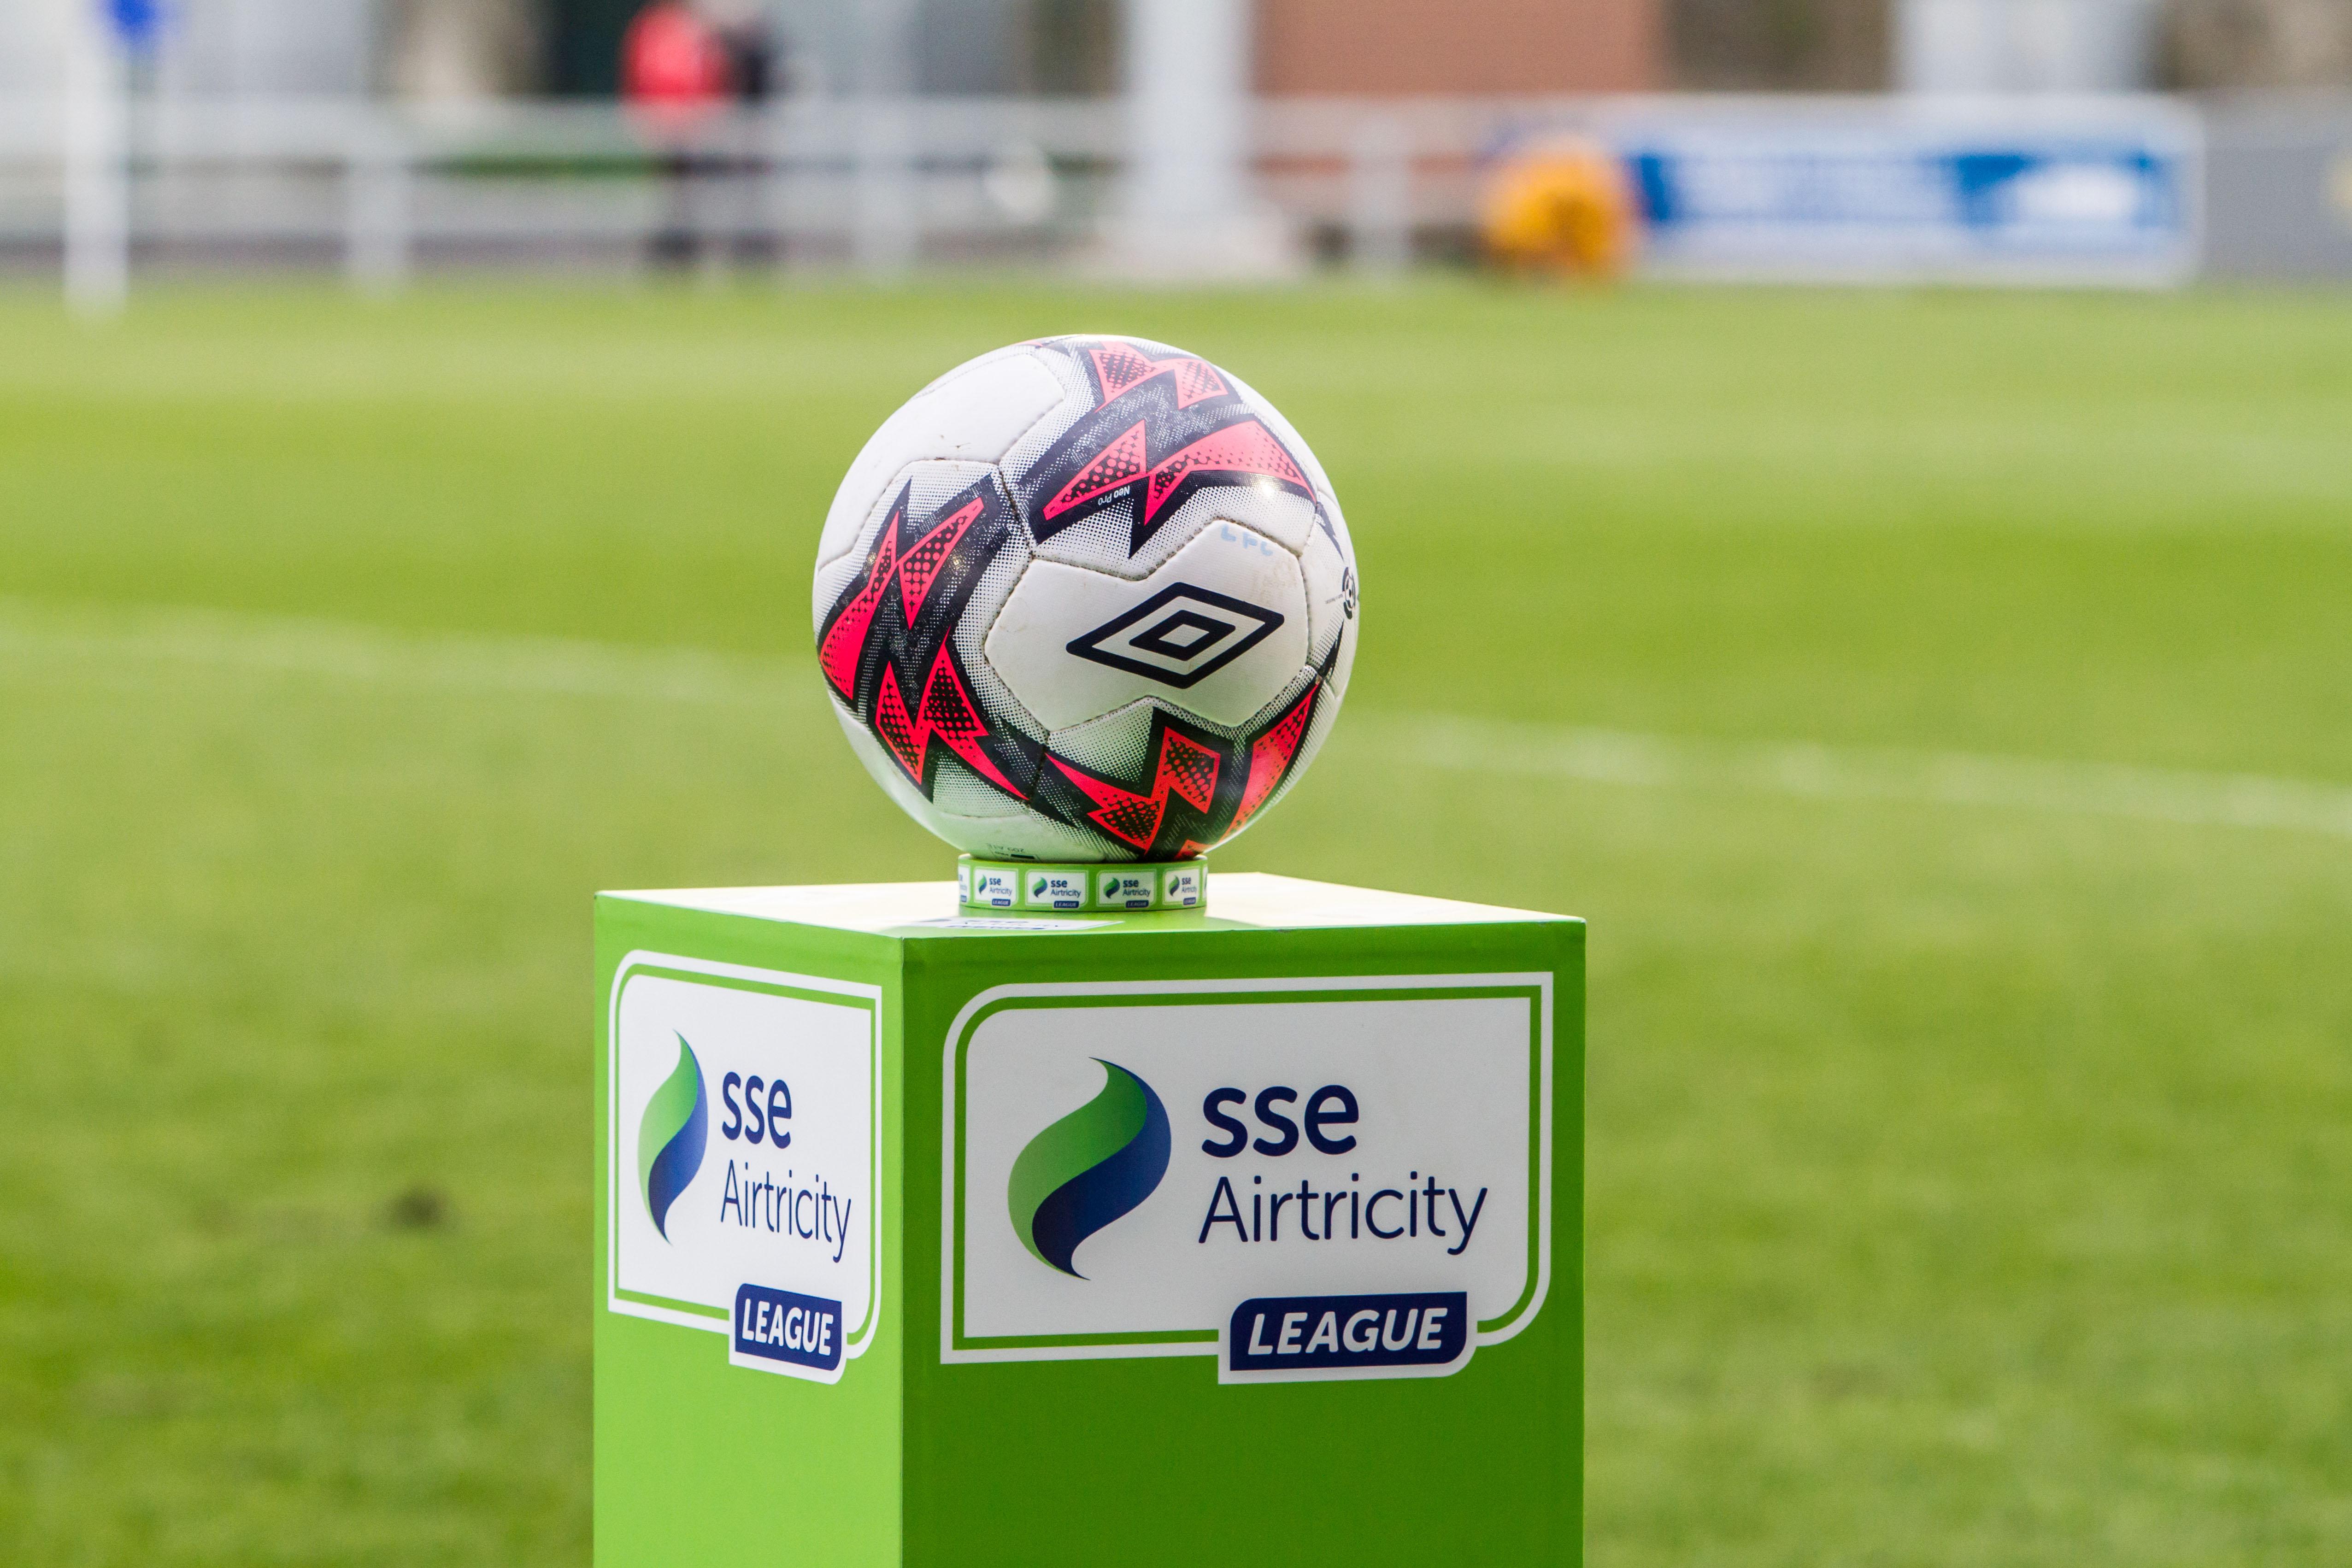 Limerick FC handed 26 point deduction - Sporting Limerick  Soccer Limericks